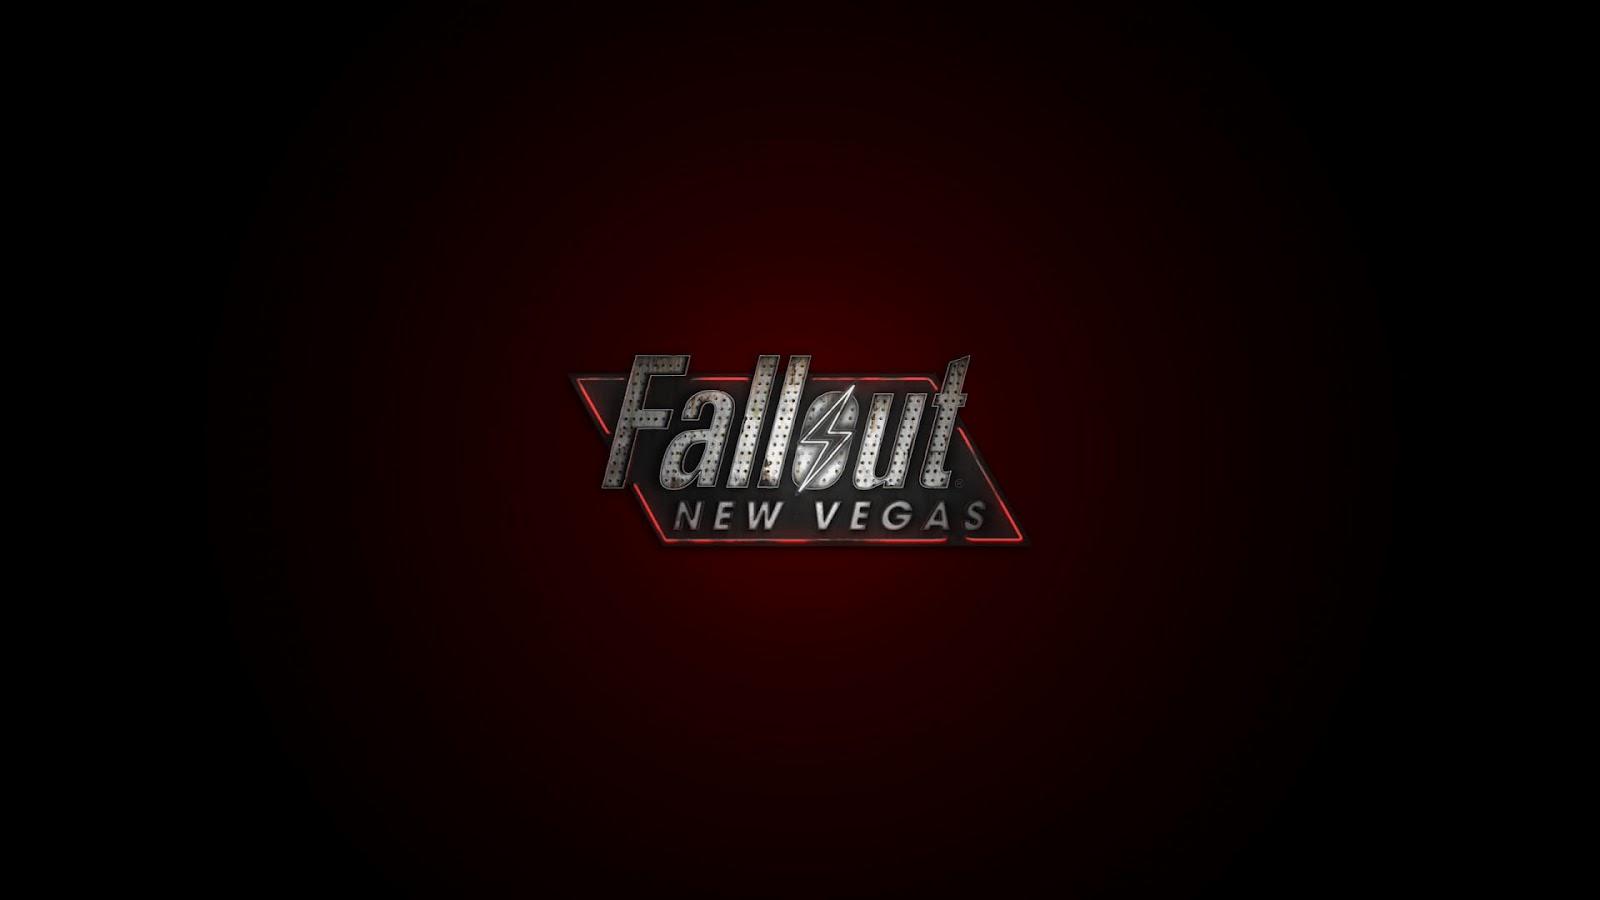 http://4.bp.blogspot.com/-alJiJo0CCzQ/UBctQ9HrKiI/AAAAAAAAHkw/ppwmYZDBjSg/s1600/fallout_new_vegas_logo_red-wallpaper-1920x1080.jpg